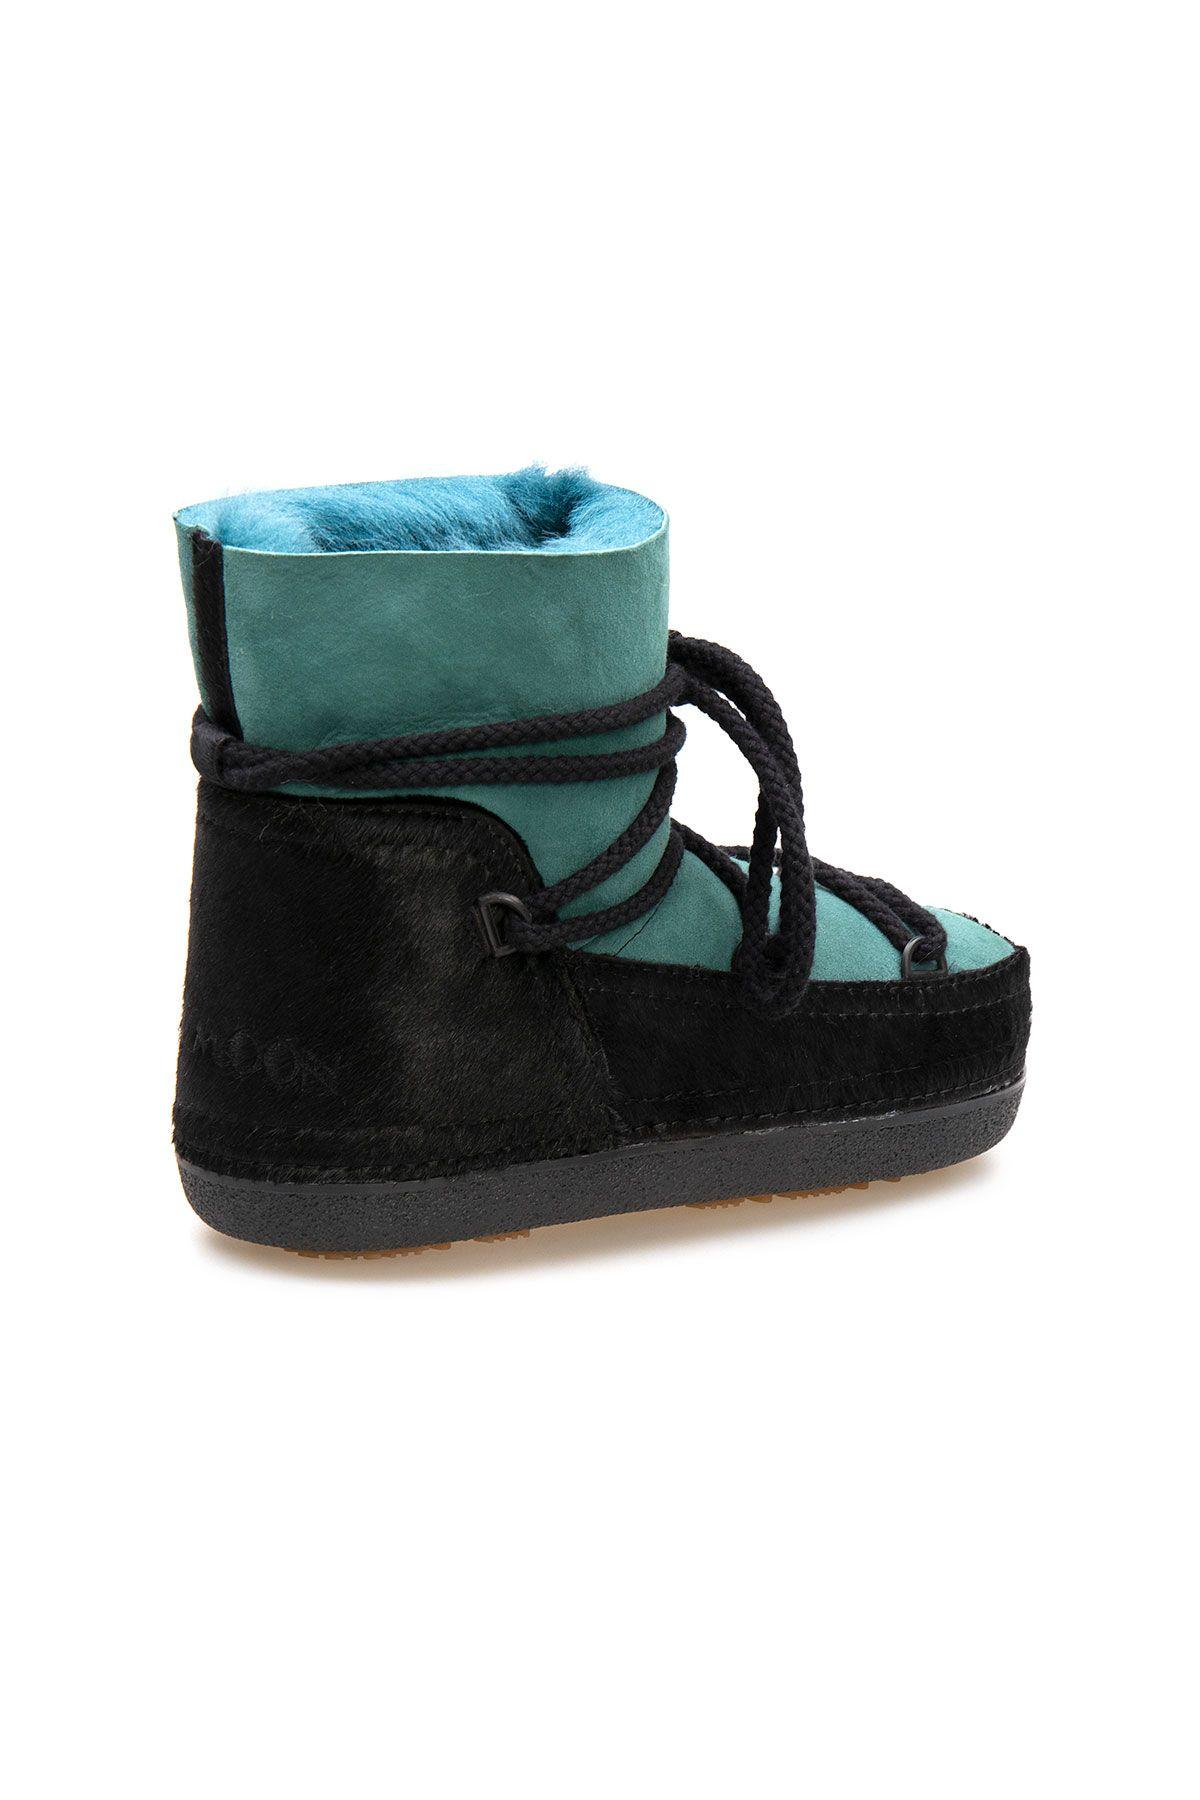 Cool Moon Women's Sheepskin Snow Boots 251331 Black